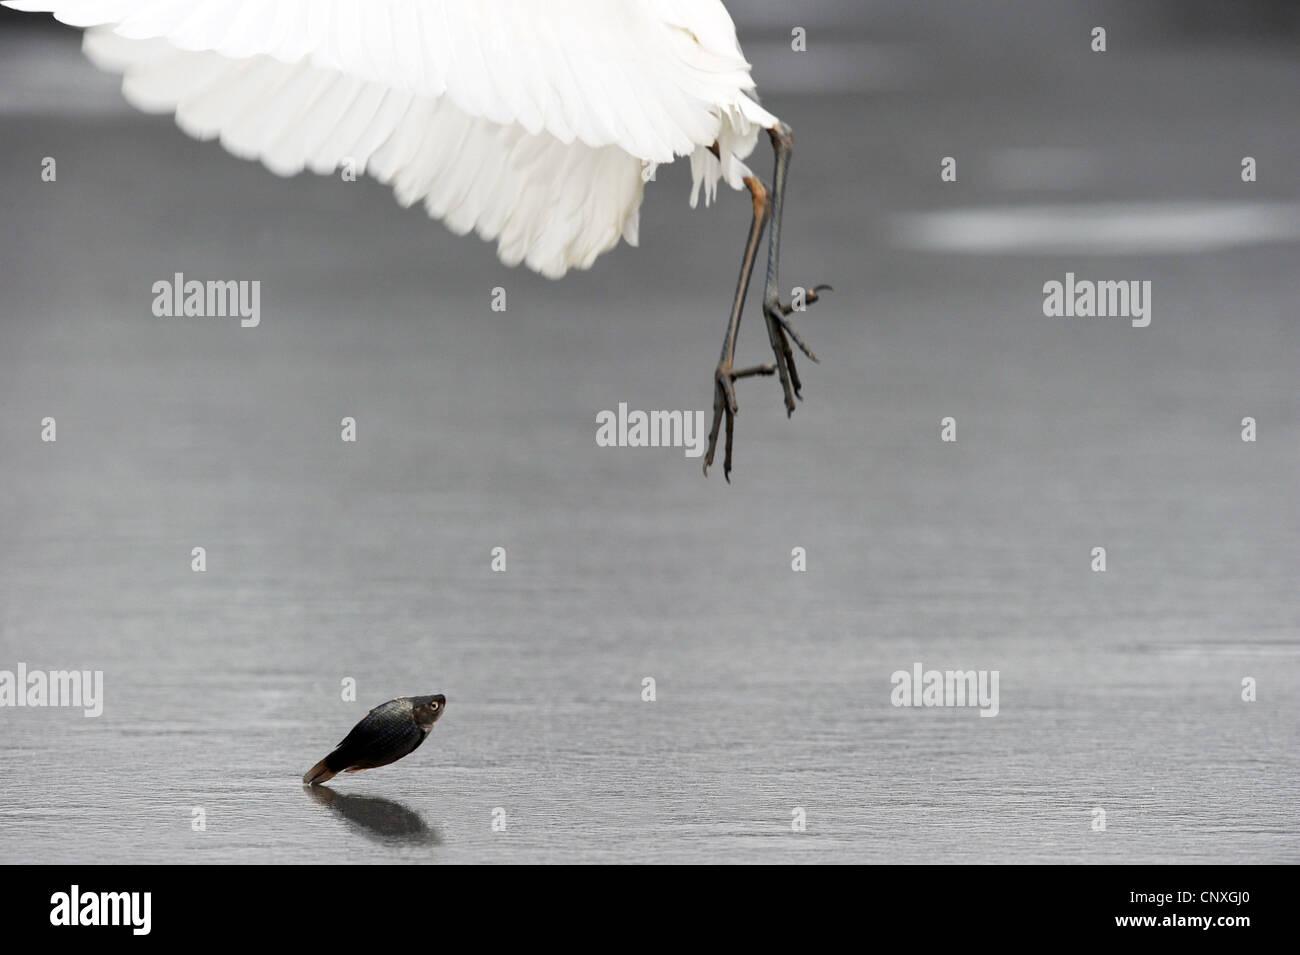 great egret, Great White Egret (Egretta alba, Casmerodius albus, Ardea alba), lets fall a caught fish on an ice - Stock Image